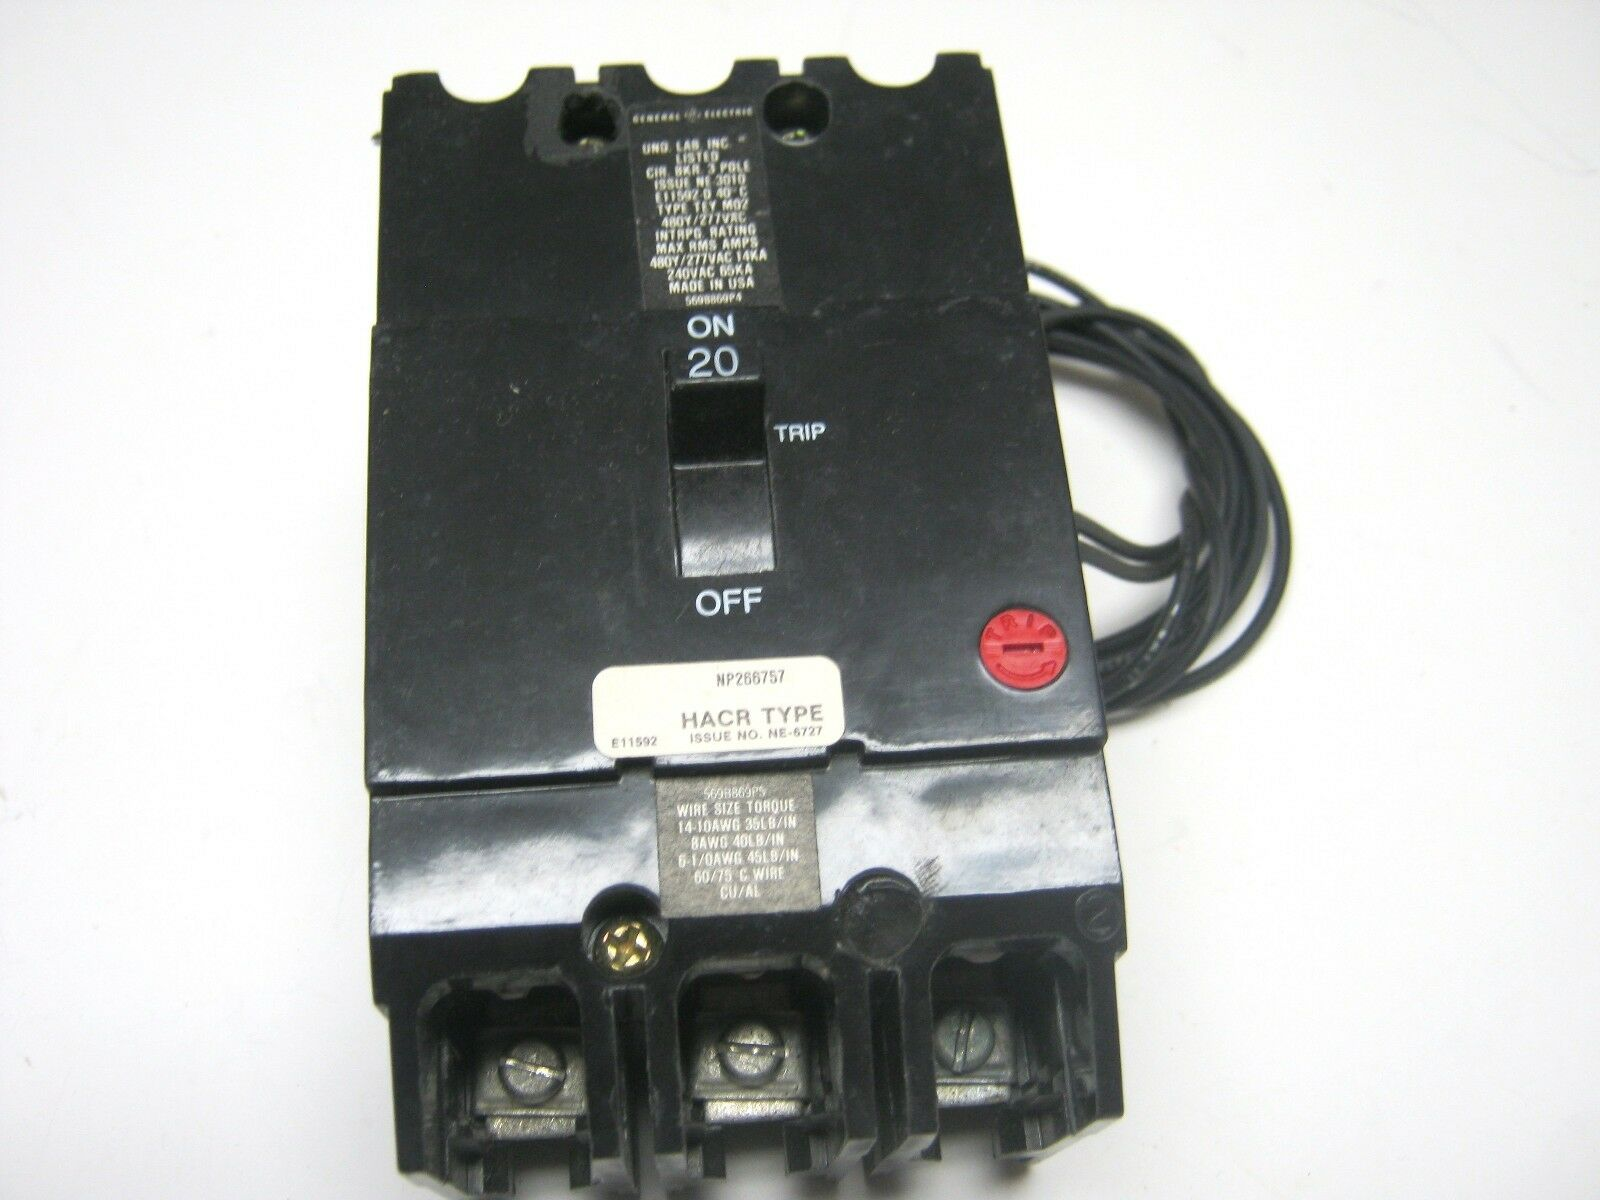 GE TEY320ST12 3/p 20 Amp Shunt Trip Circuit Breaker | eBay